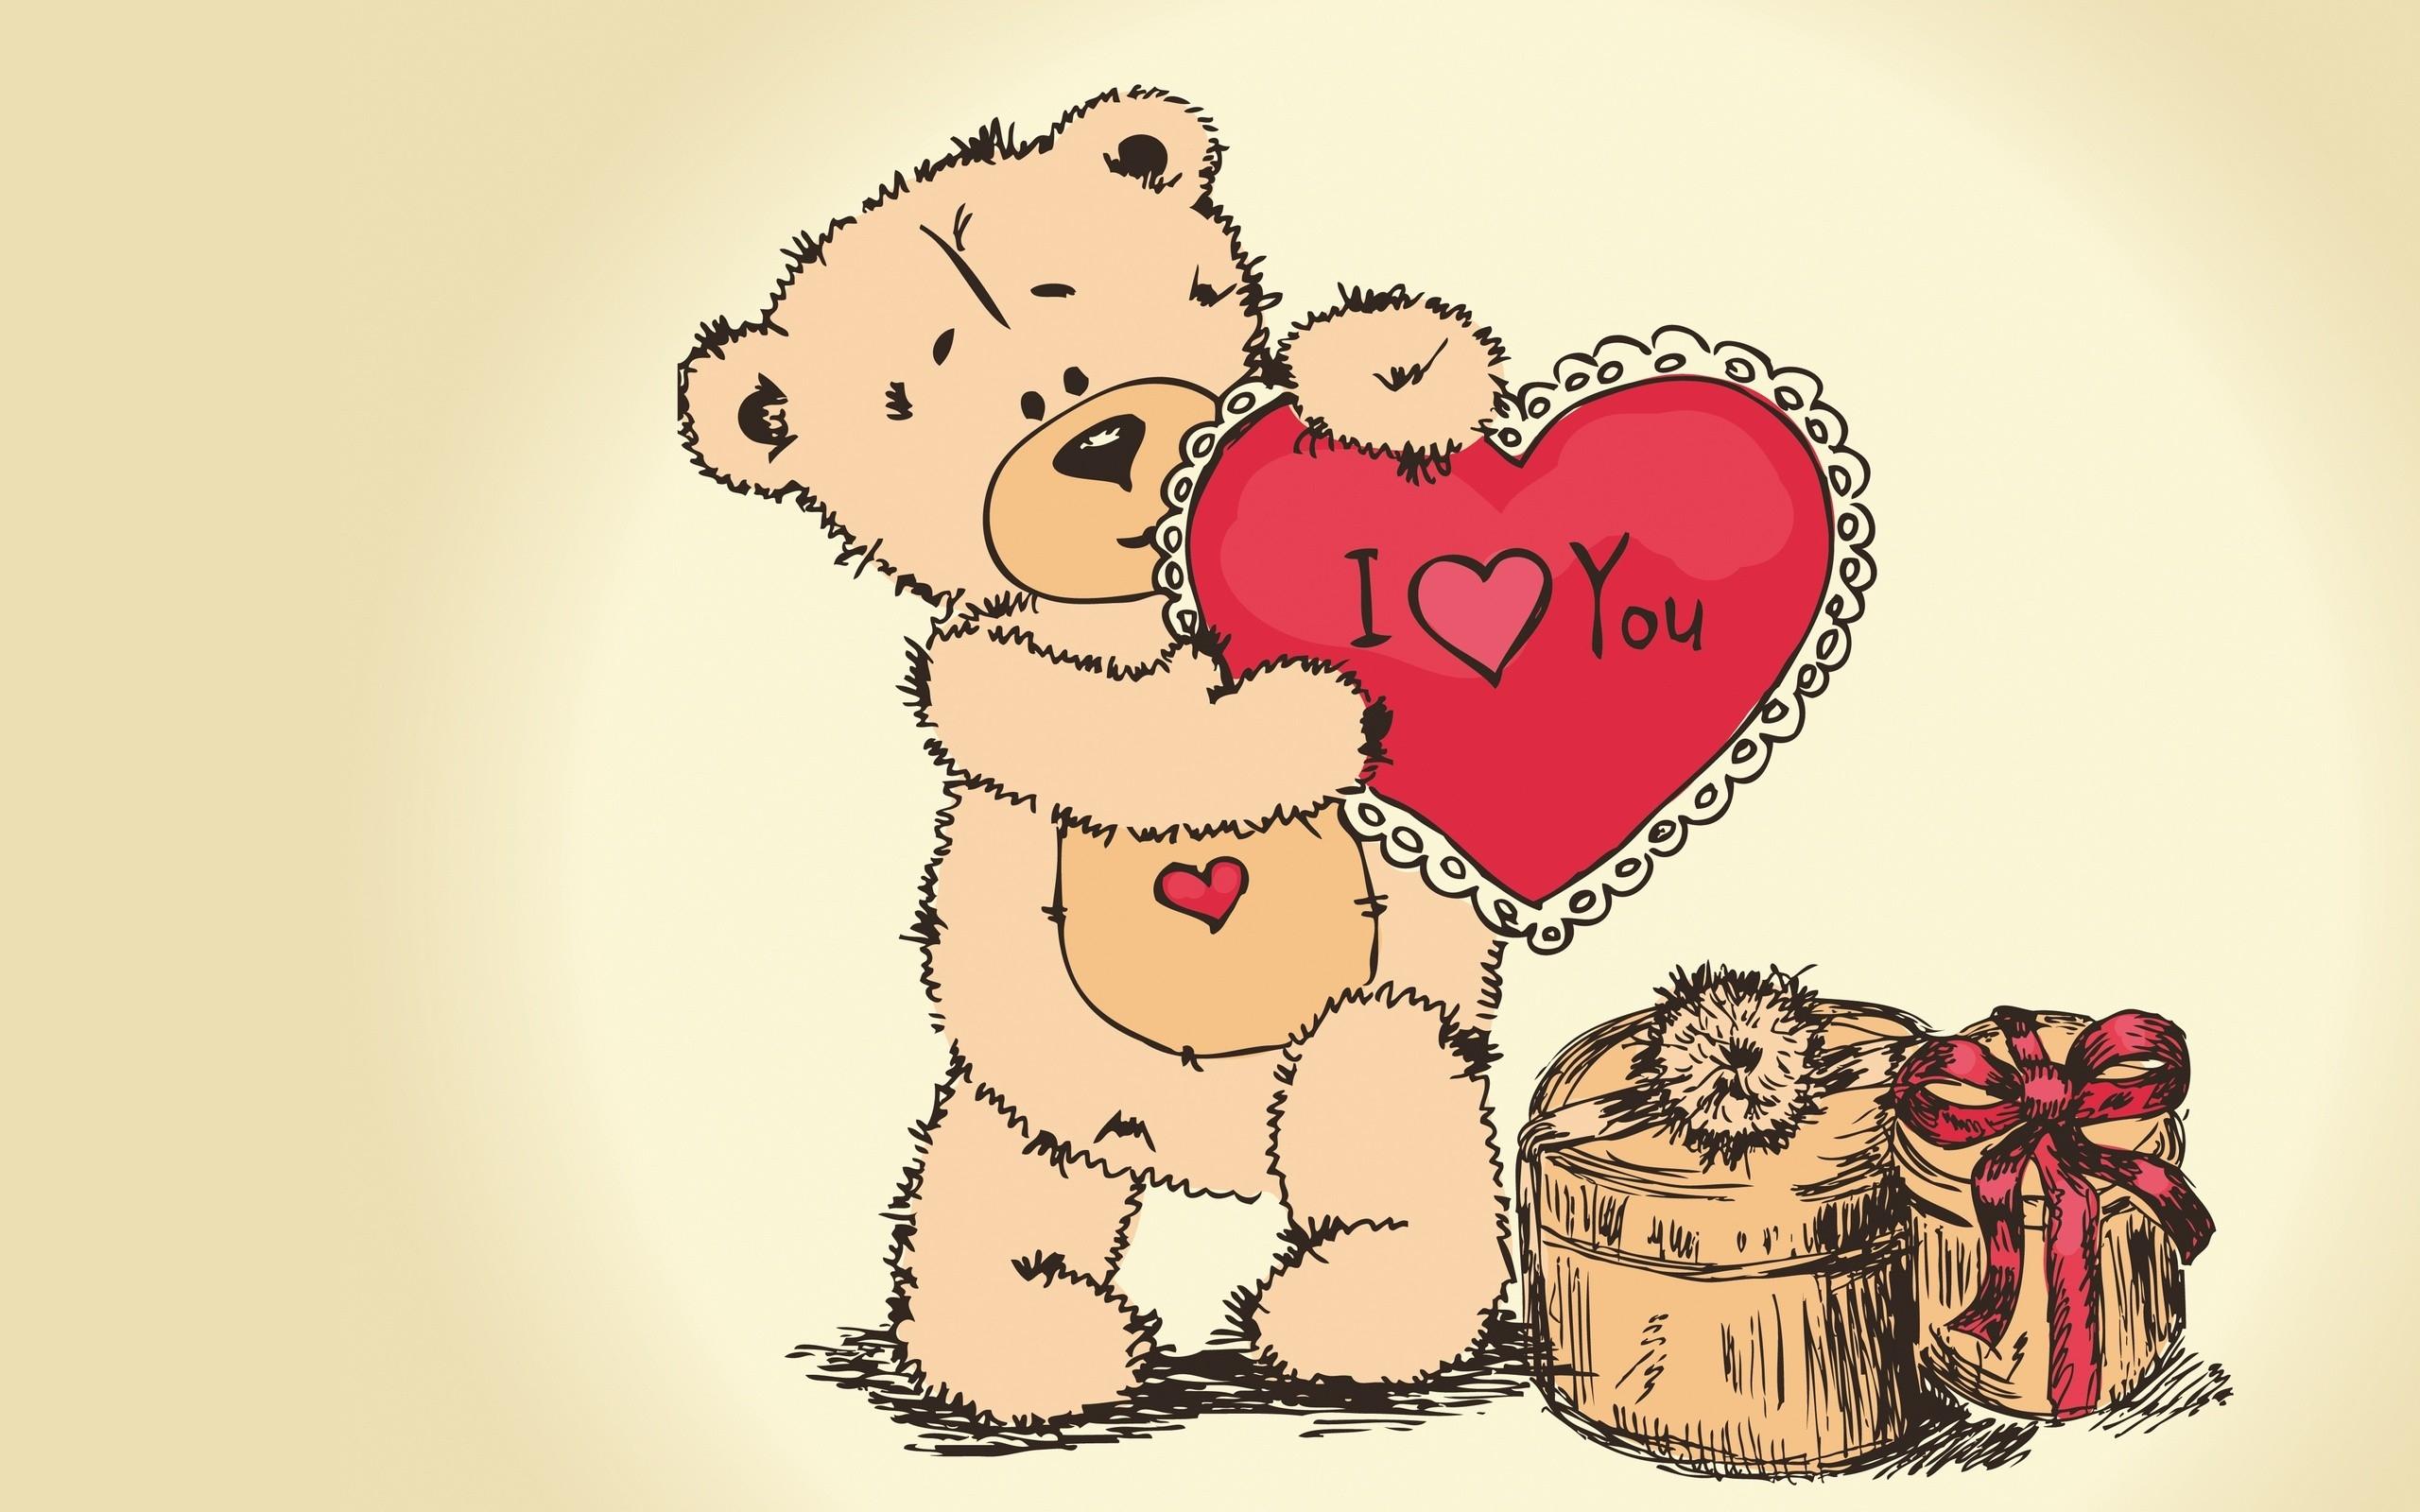 я люблю тебя и поздравляю картинки